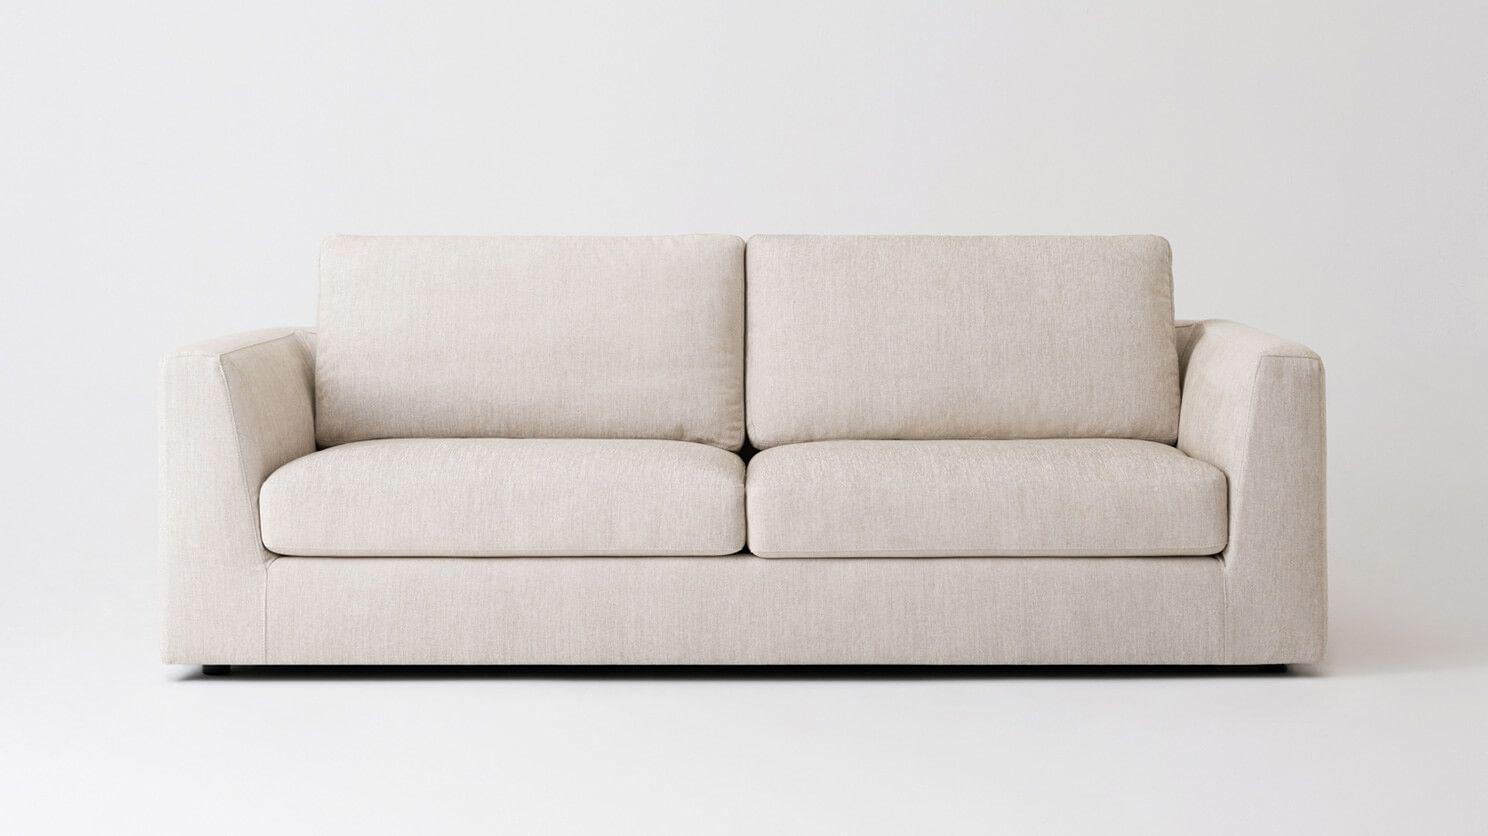 Cello Sofa Memory Foam Seat Cushion Fabric Sofa Mid Century Modern Furniture